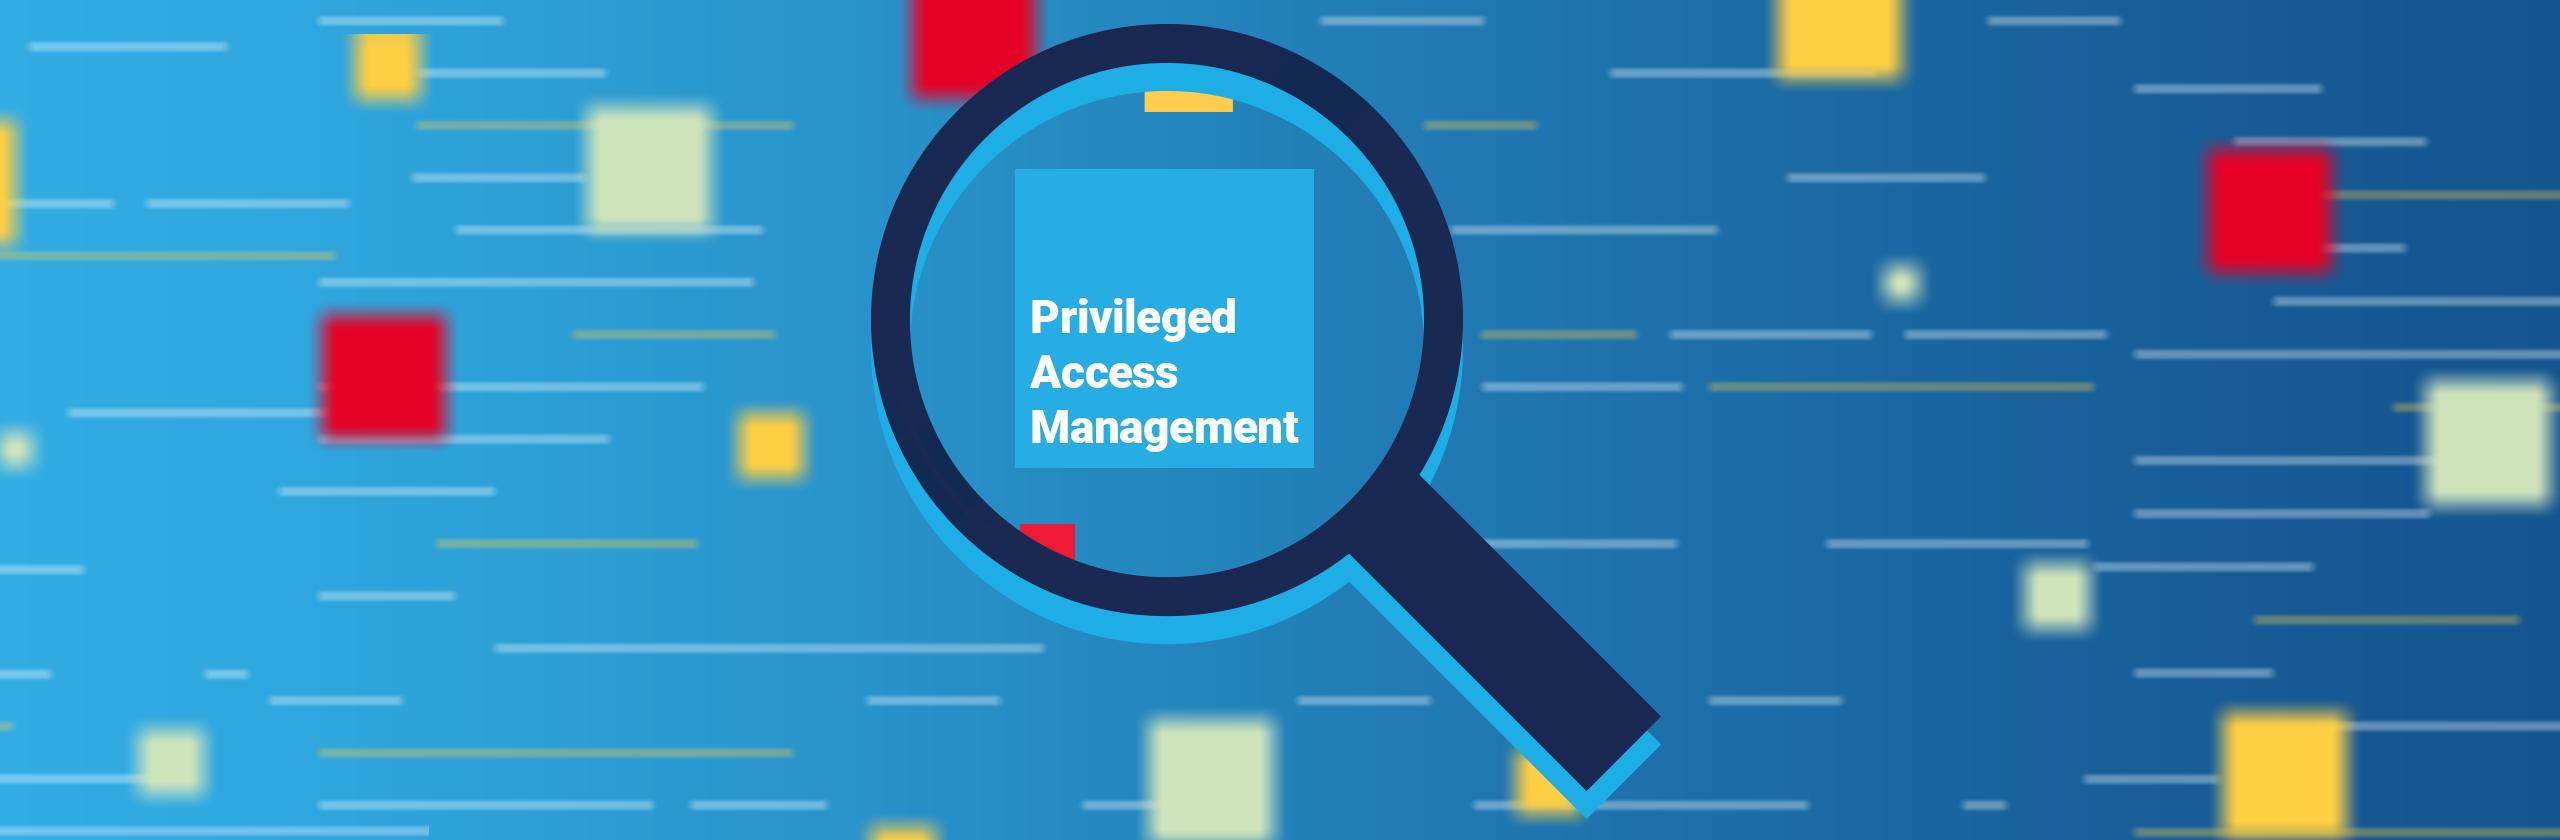 Privileged access management banner